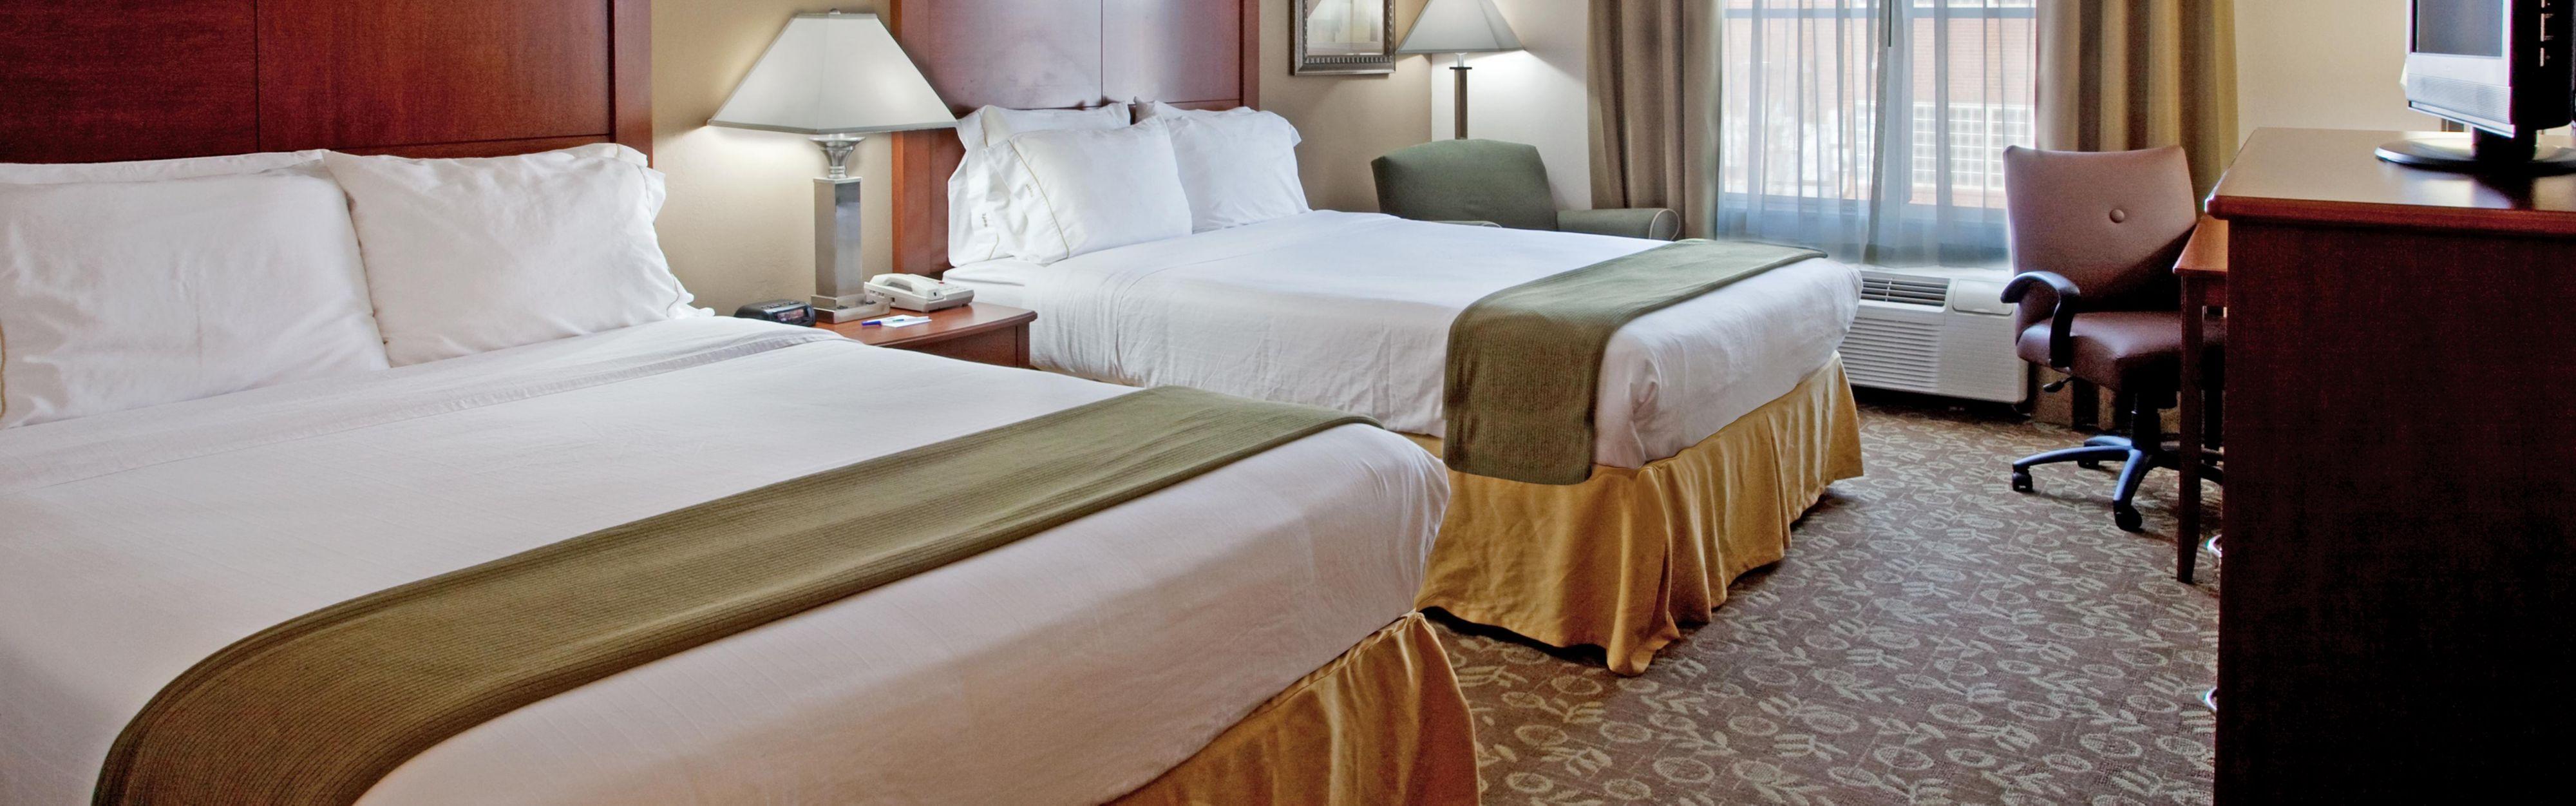 Holiday Inn Express Chapel Hill image 1